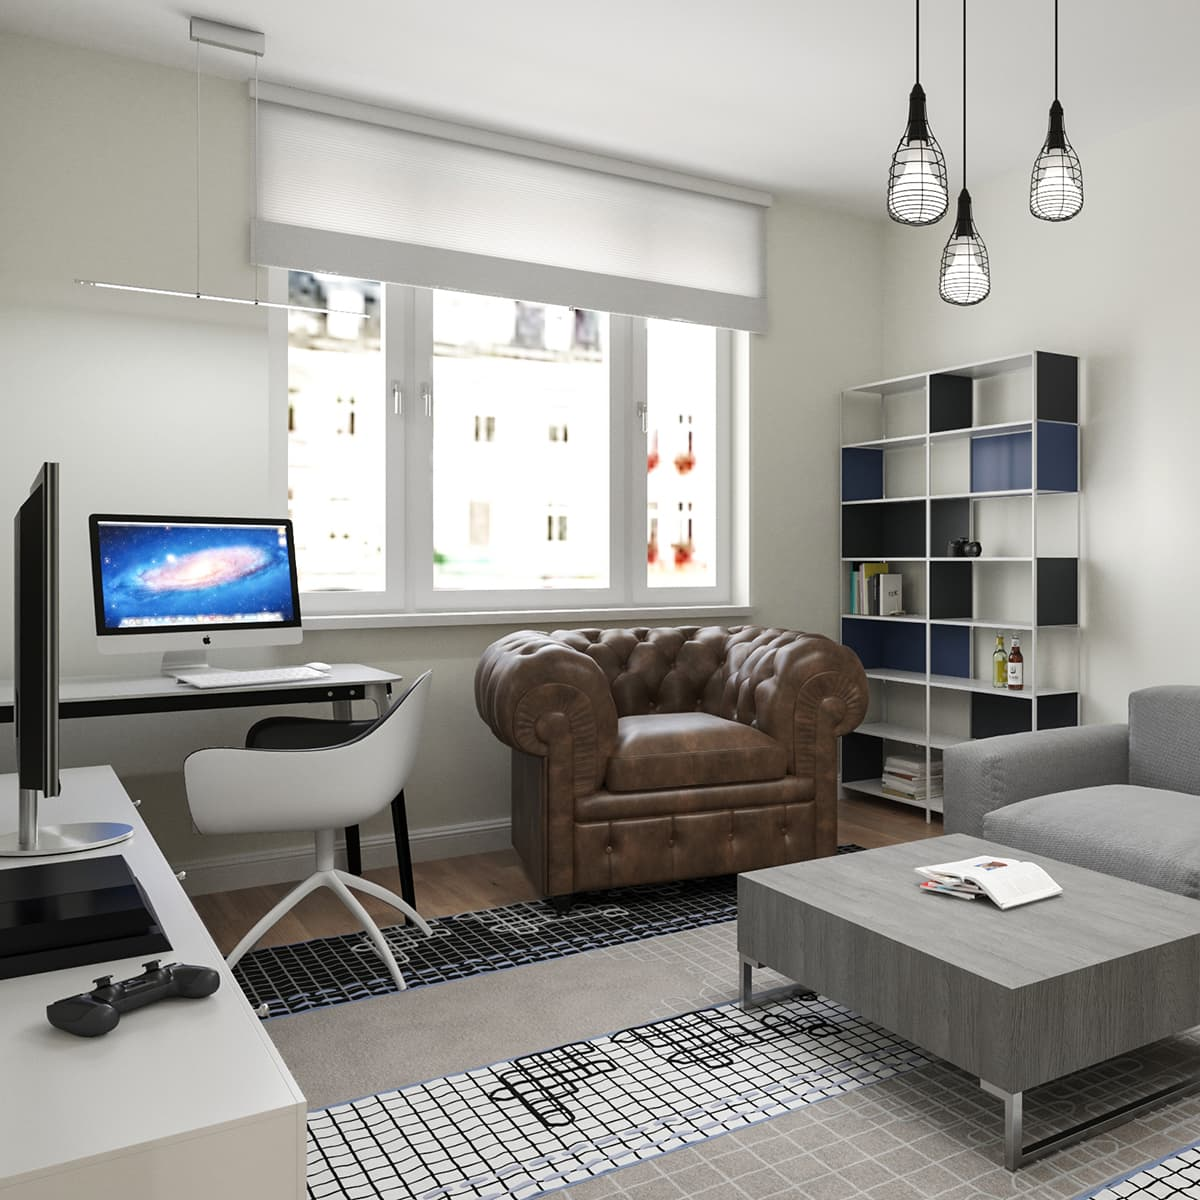 Homestaging - Planungsdetail.de